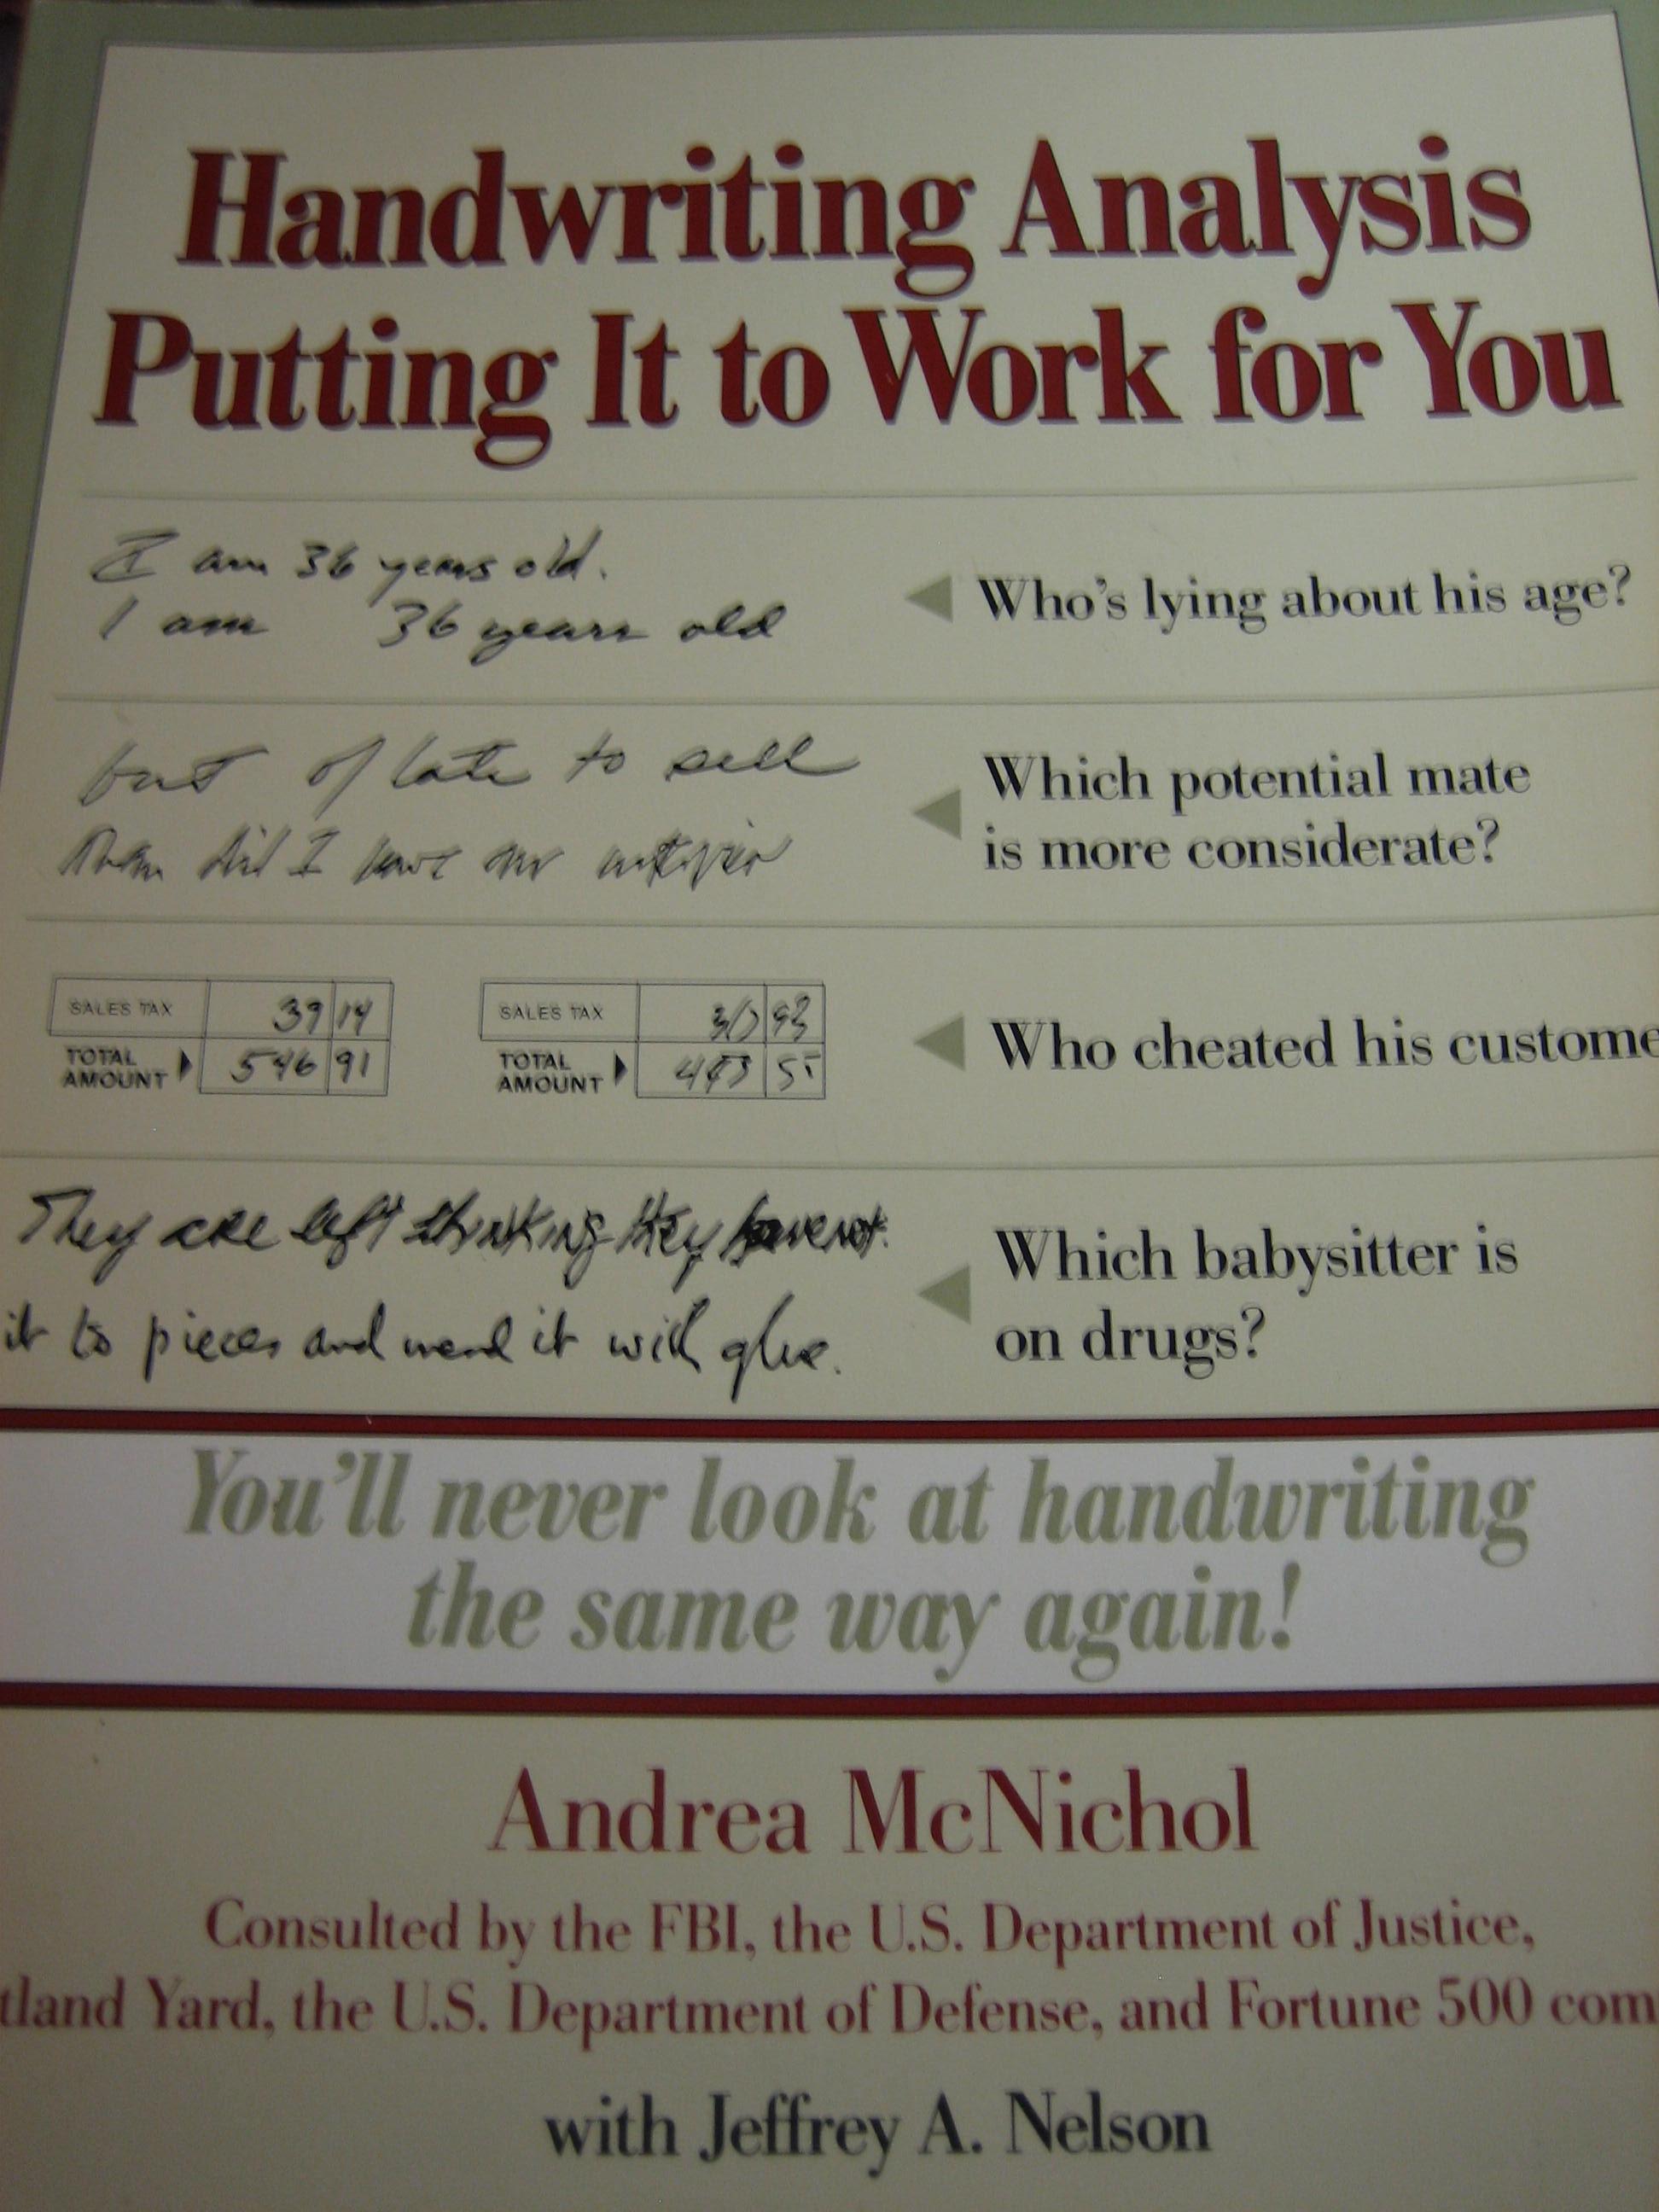 ANDREA MCNICHOL HANDWRITING ANALYSIS PDF